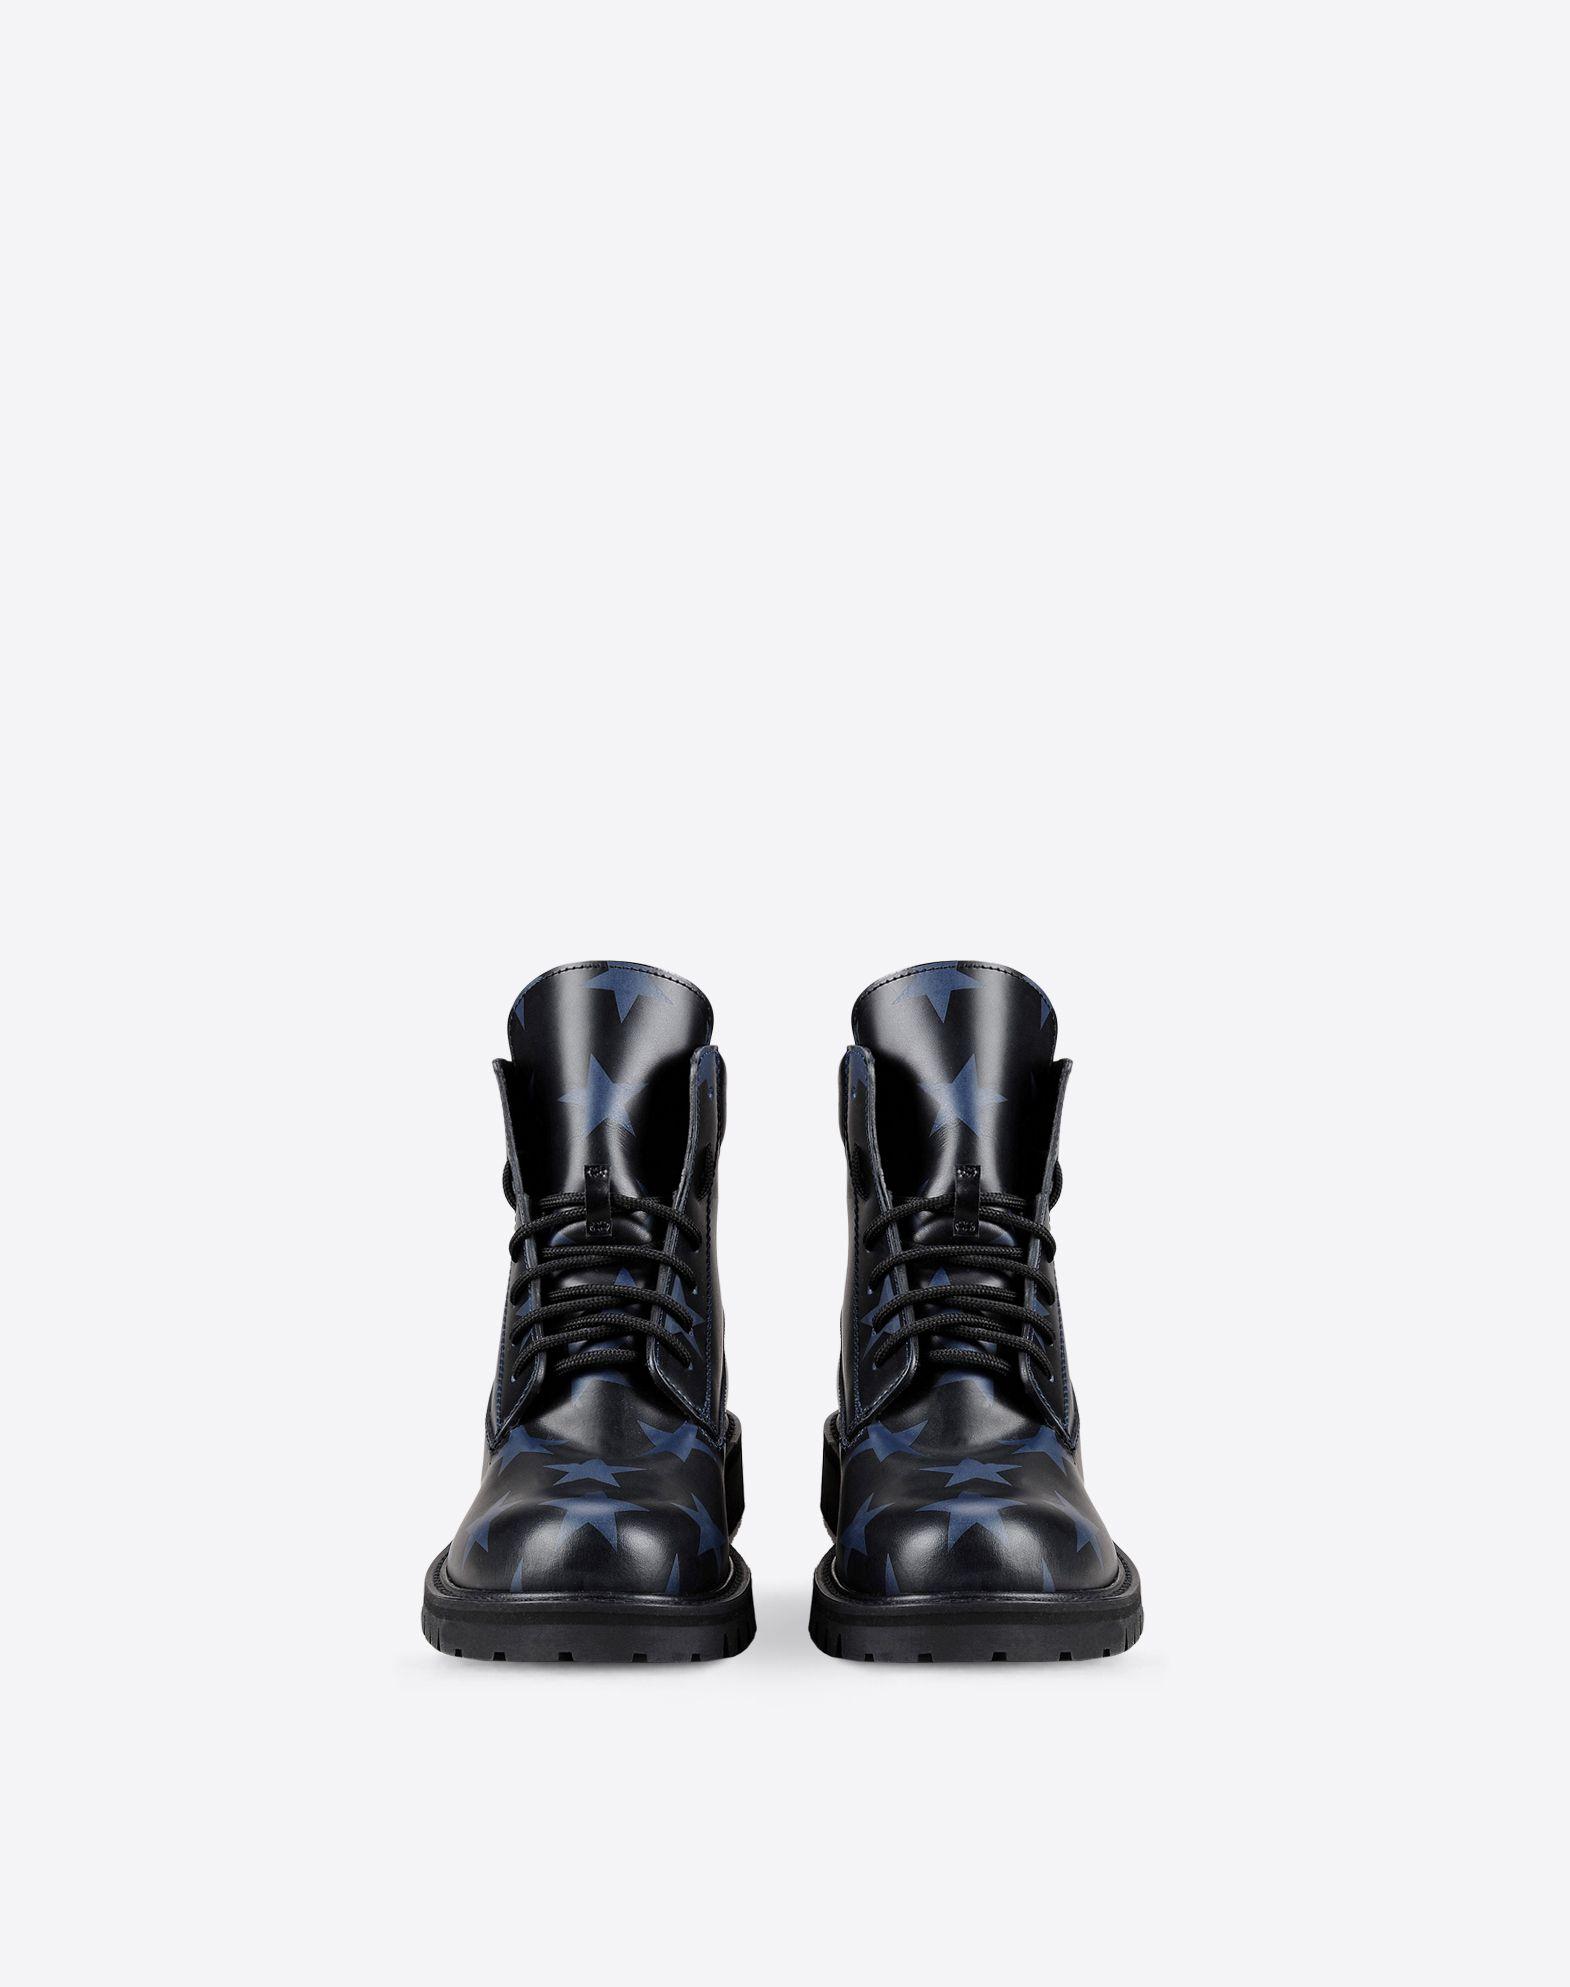 VALENTINO Two-tone pattern Laces Rubber sole Round toeline Square heel  11017270uj